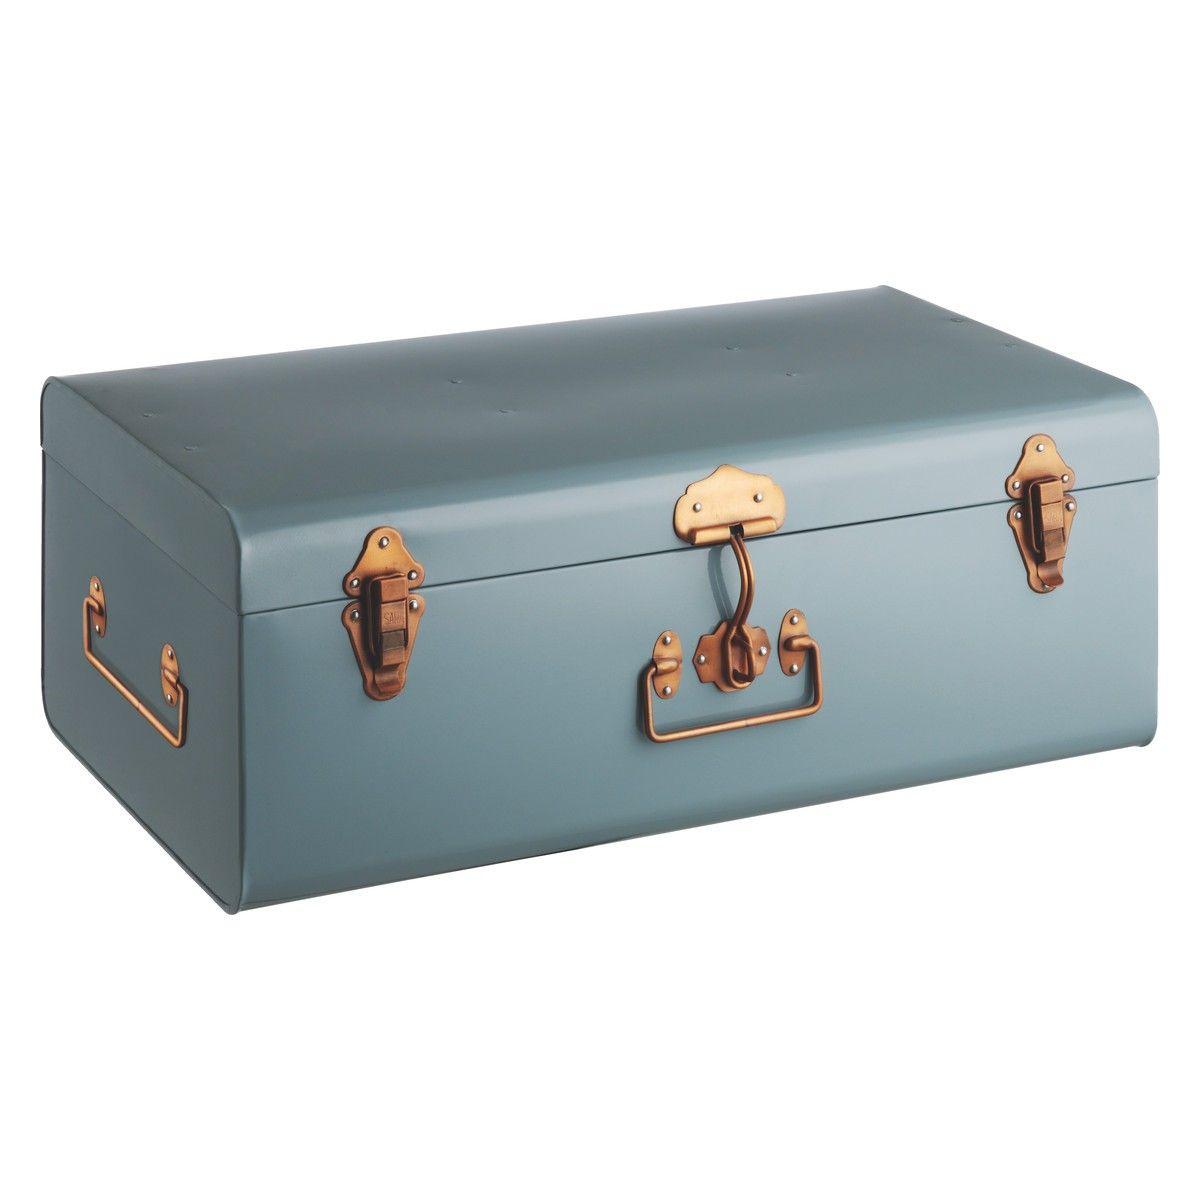 Elegant Blue Metal Storage Trunk | Img @ Habitat UK. Http://www.